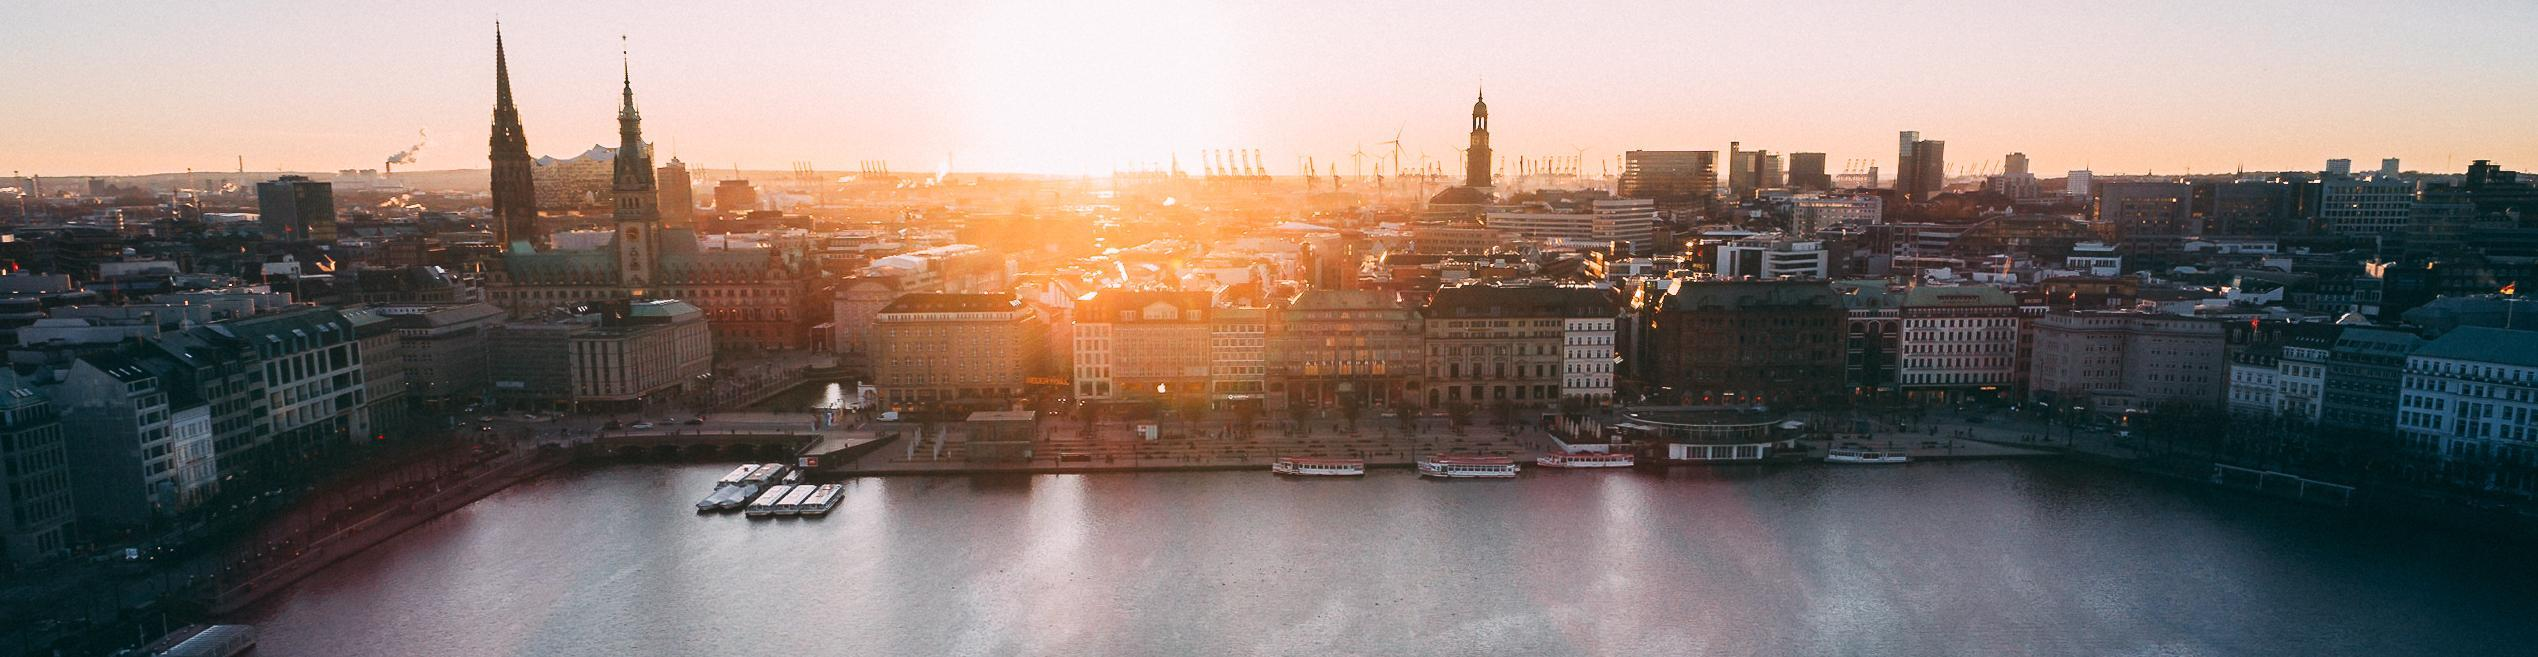 ECER-Konferenz 2019 In Hamburg